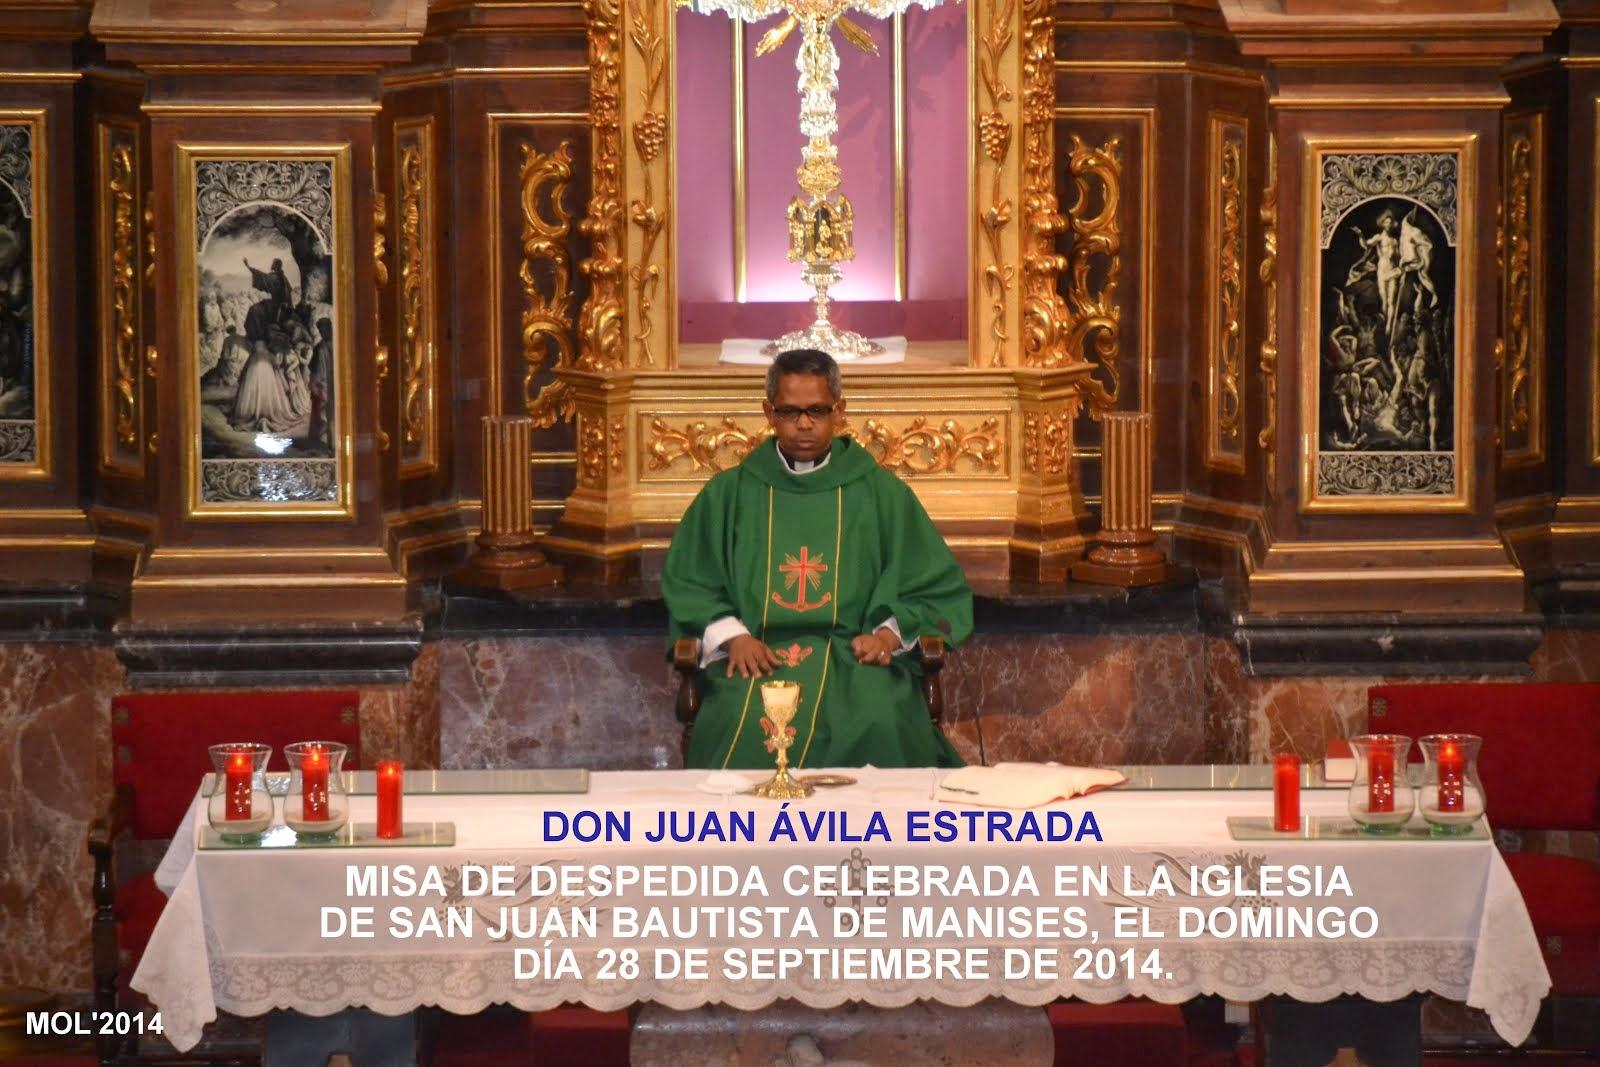 MISA DE DESPEDIDA A DON JUAN ÁVILA ESTRADA